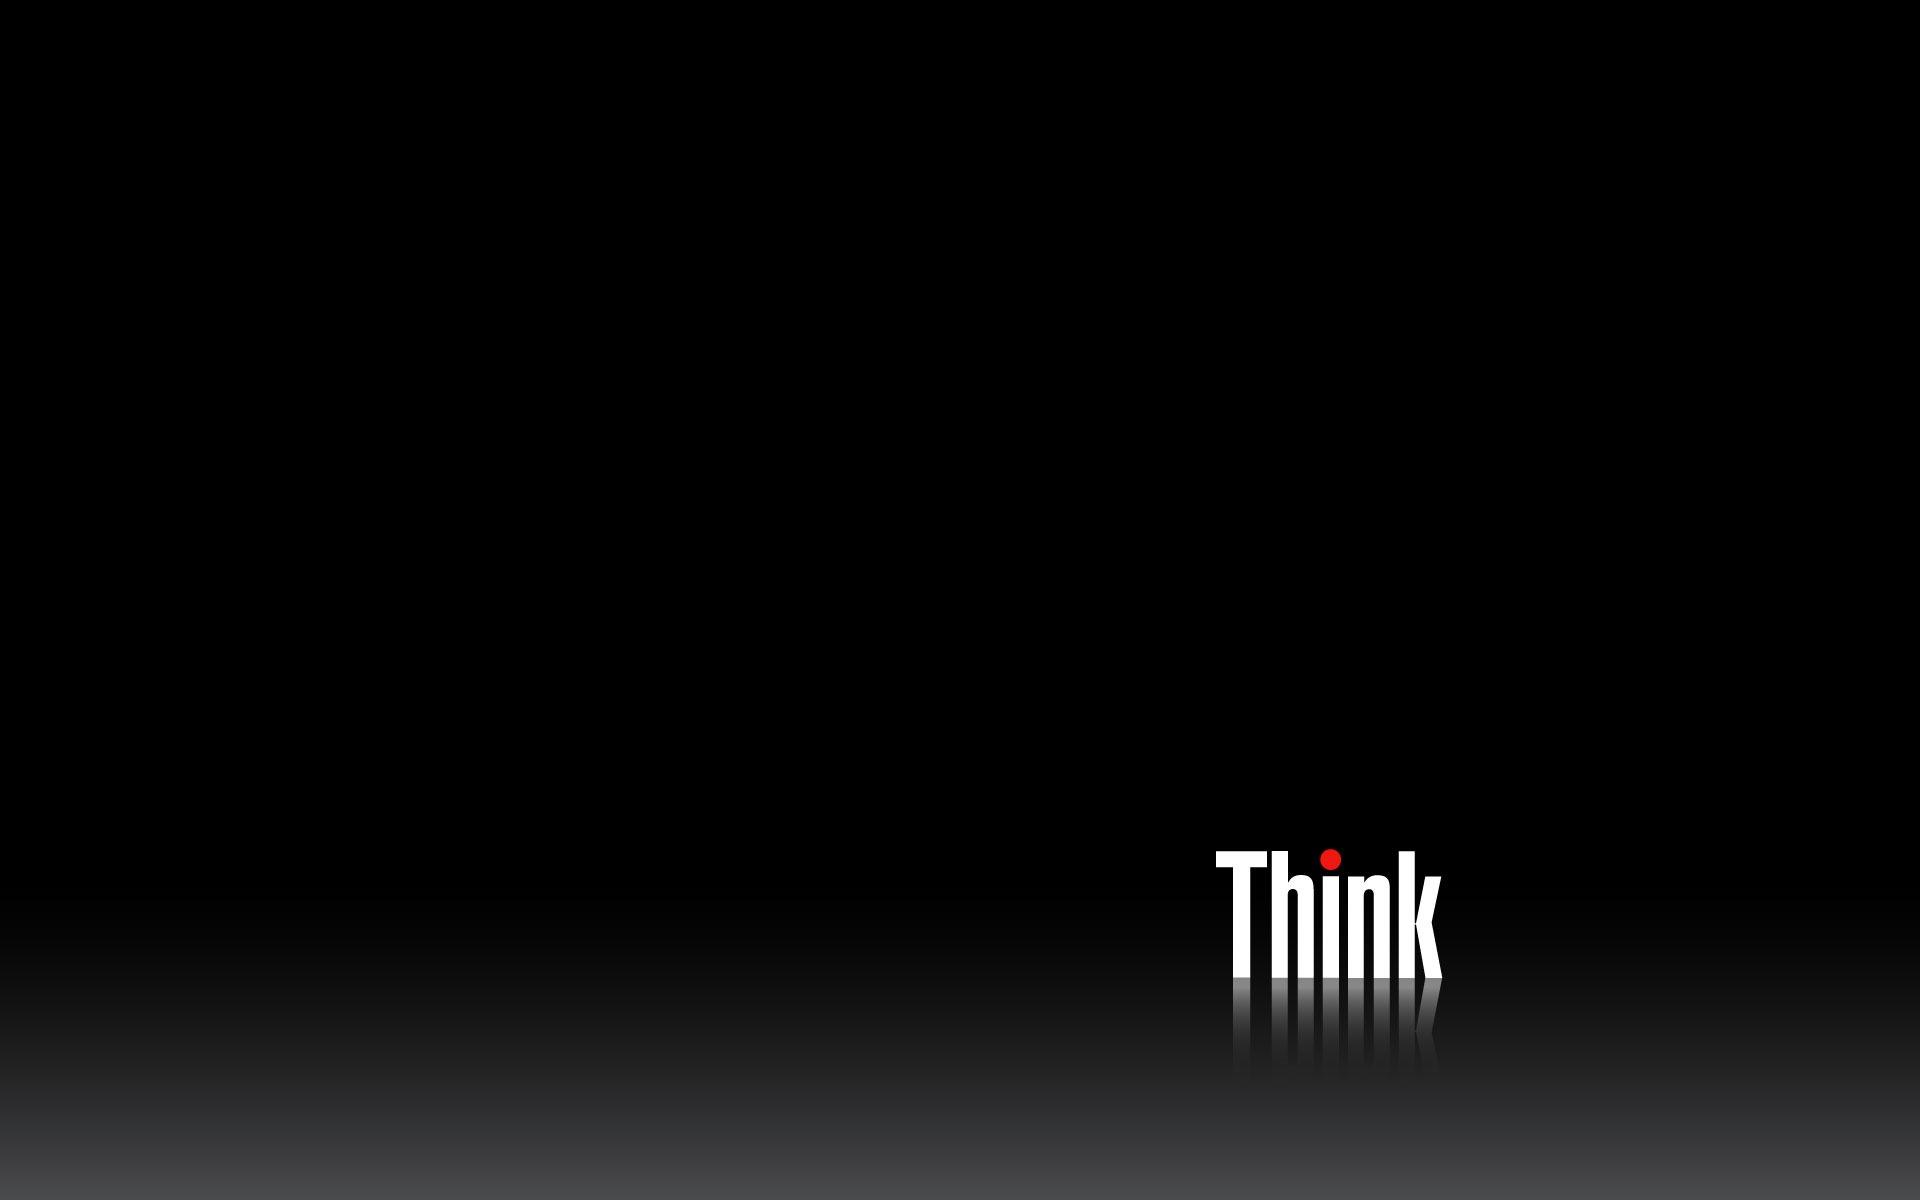 Lenovo Thinkpad wallpaper 252857 1920x1200